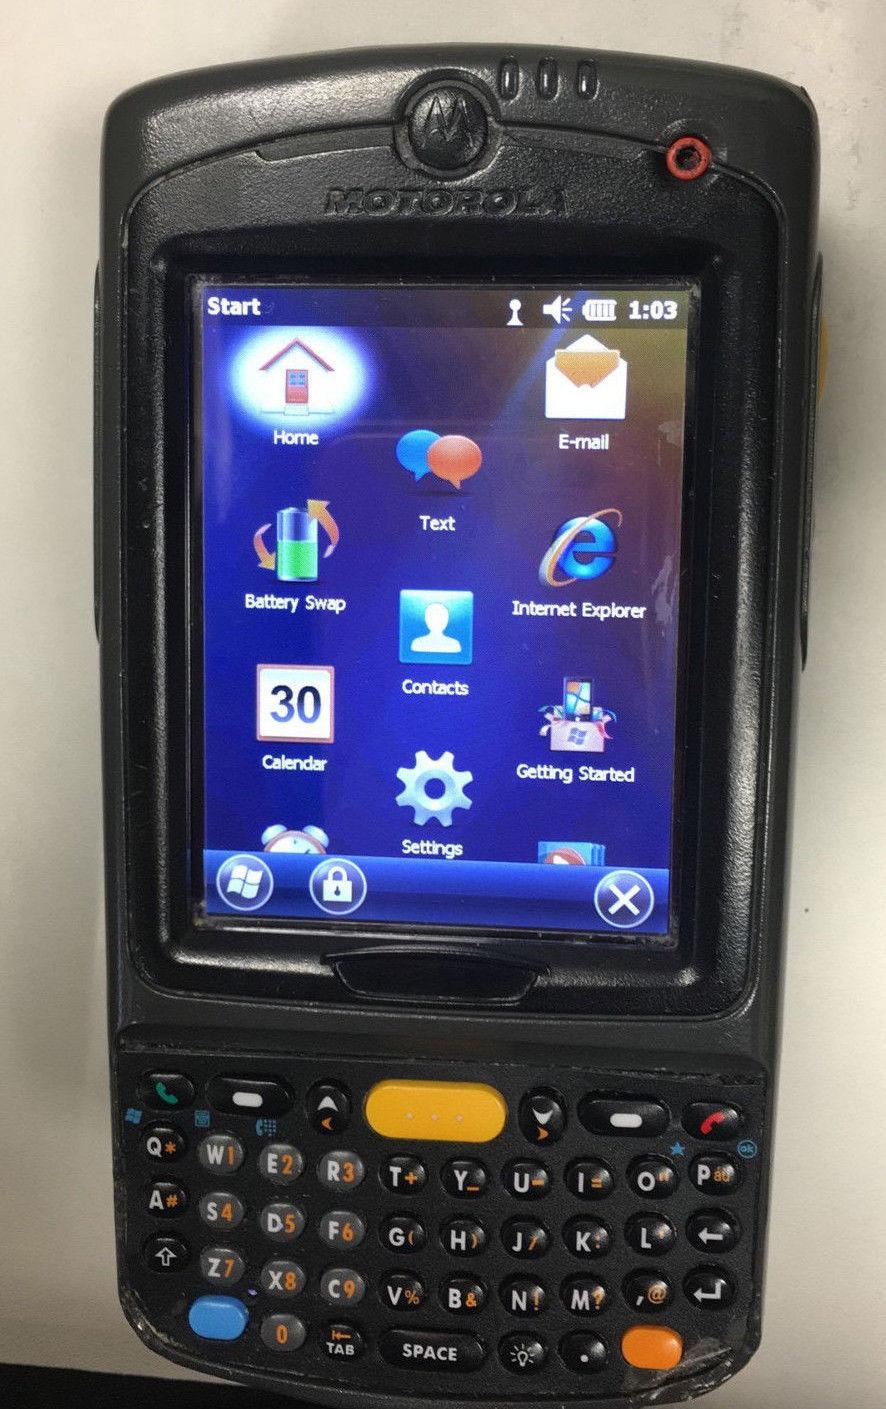 Motorola Symbol Pocket PC Barcode Scanner and 35 similar items